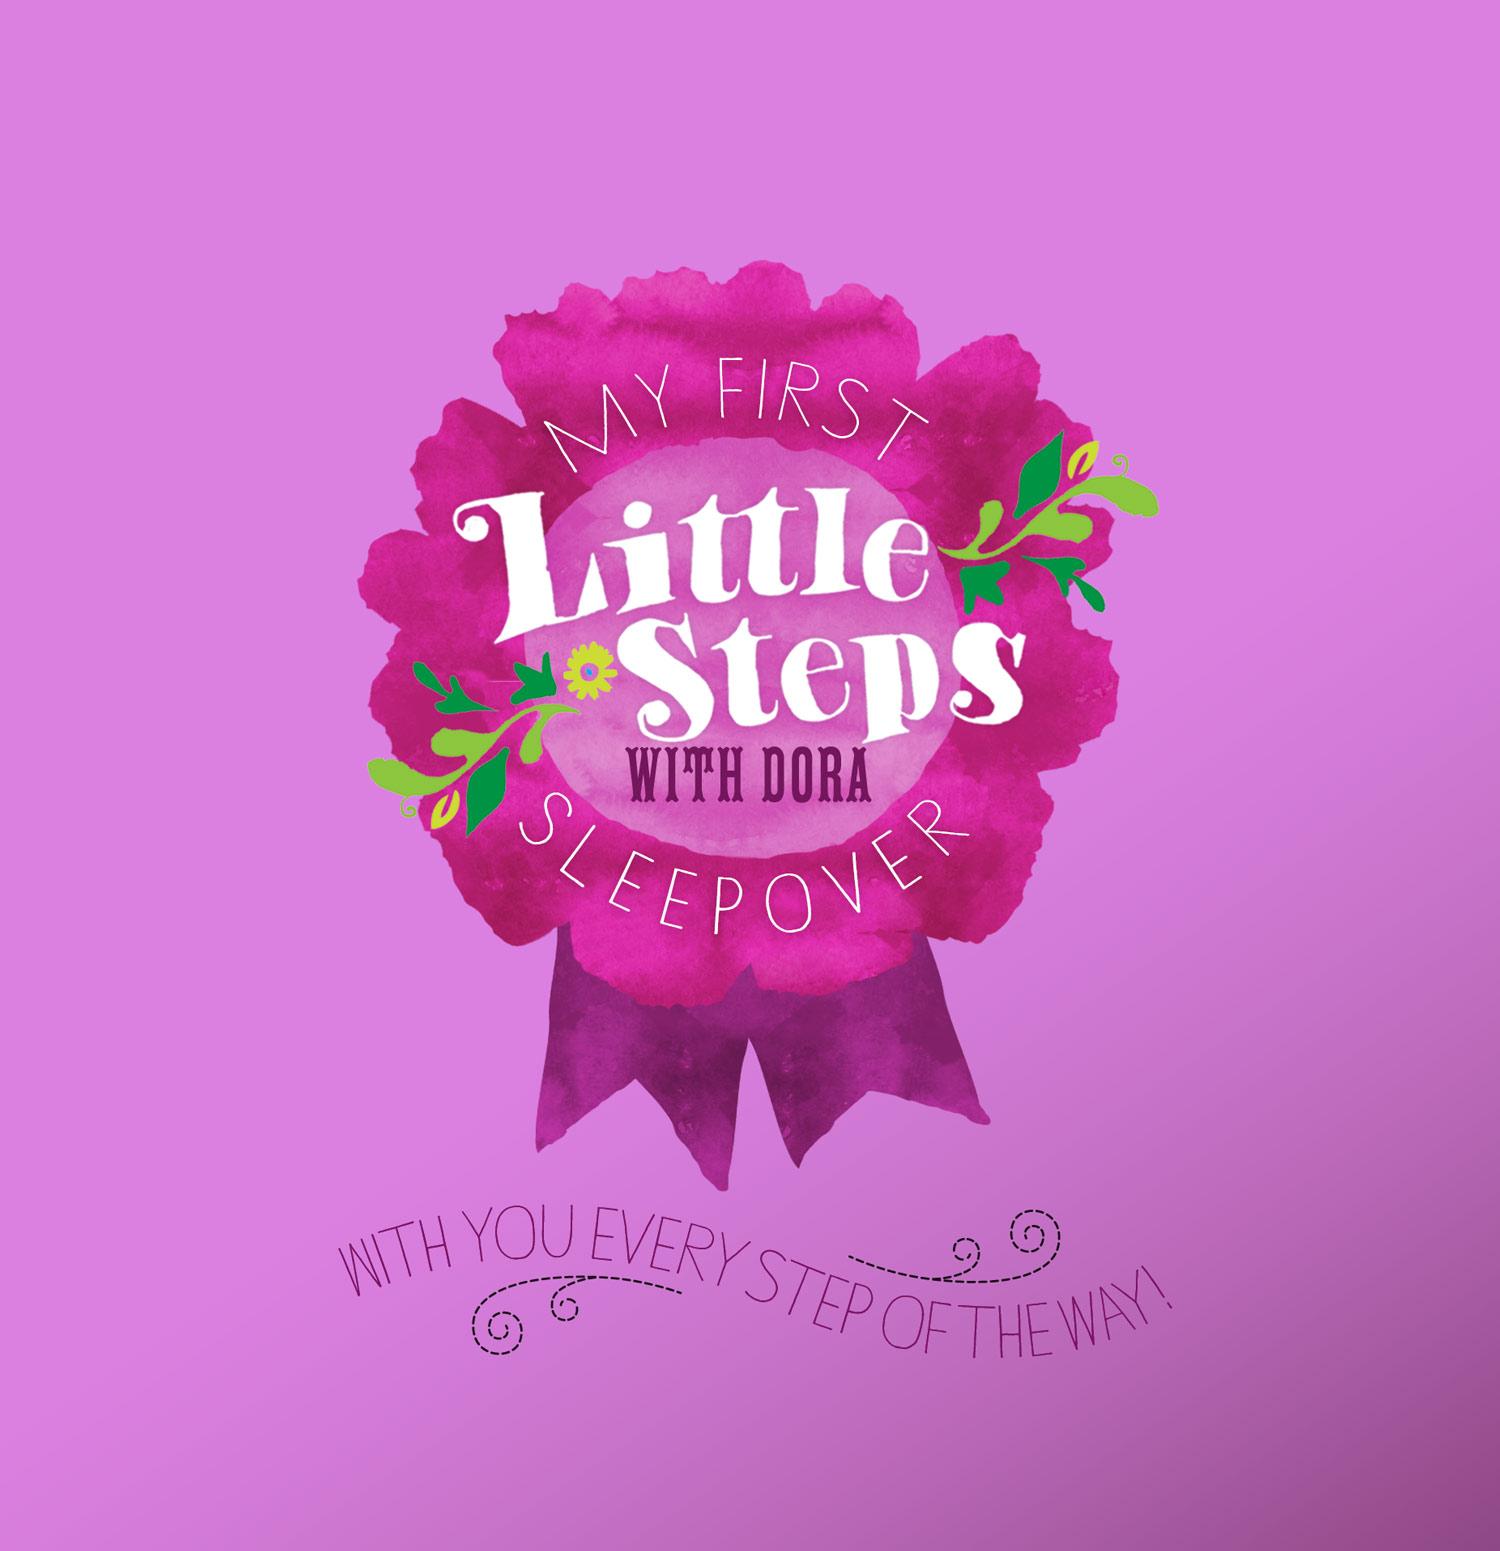 Dora the Explorer campaign rosette little steps design Brittany Hurdle fmg